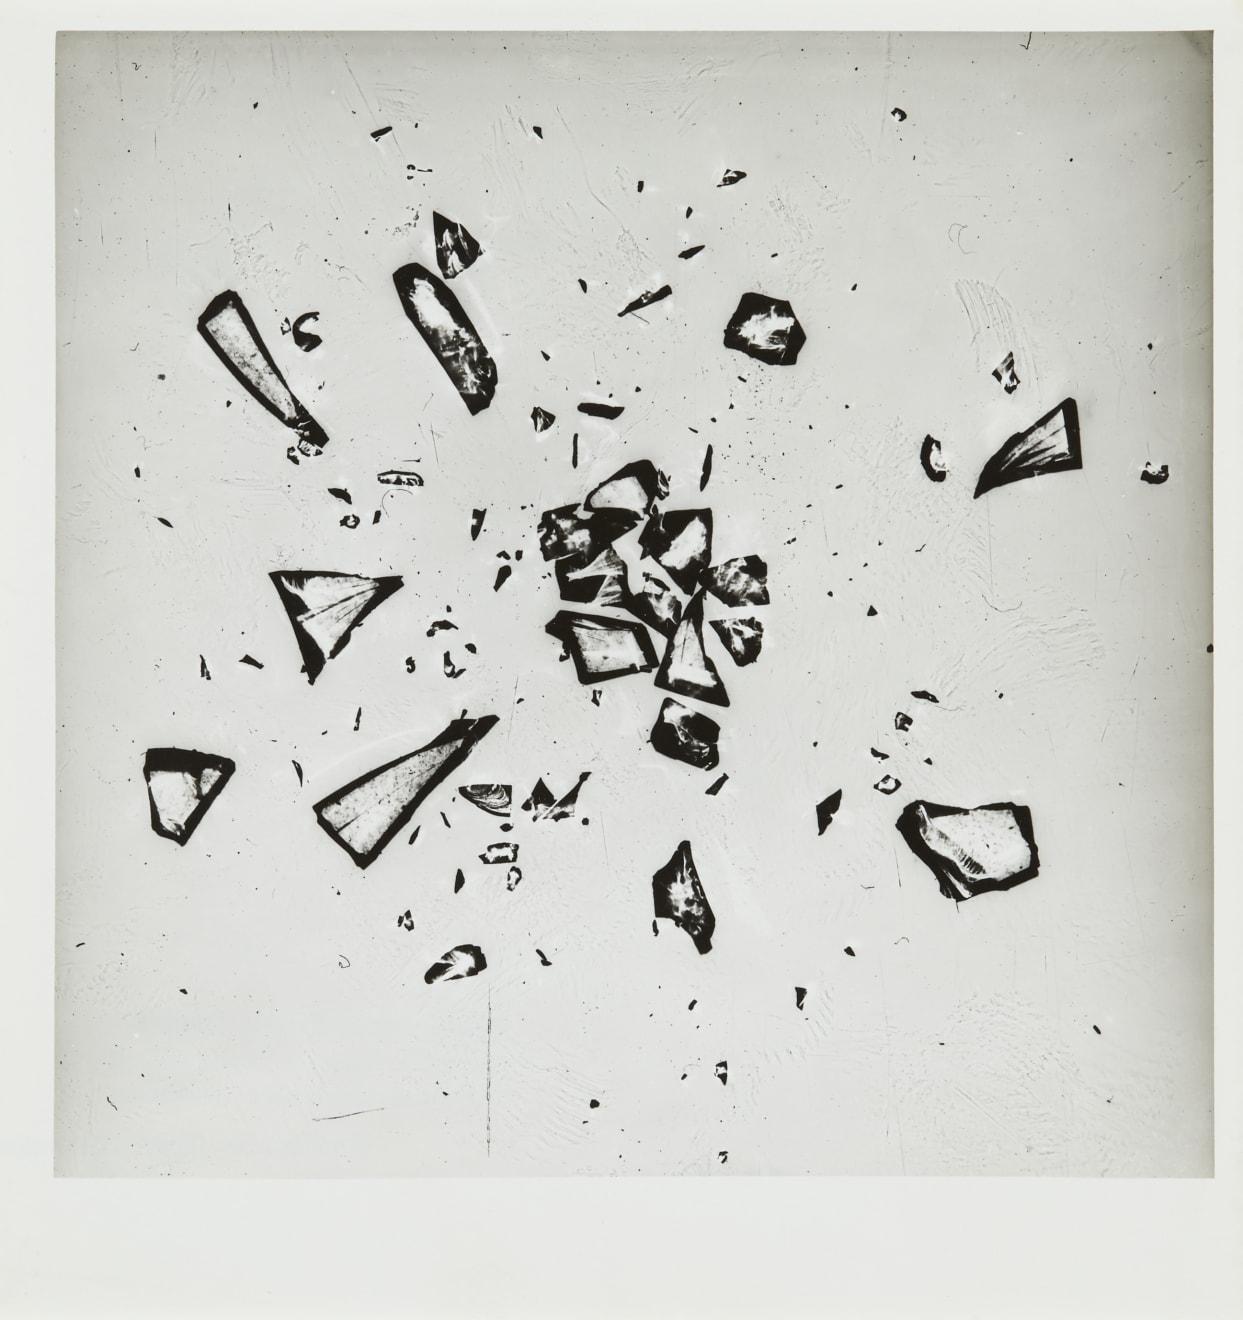 Kansuke Yamamoto, Work, 1959